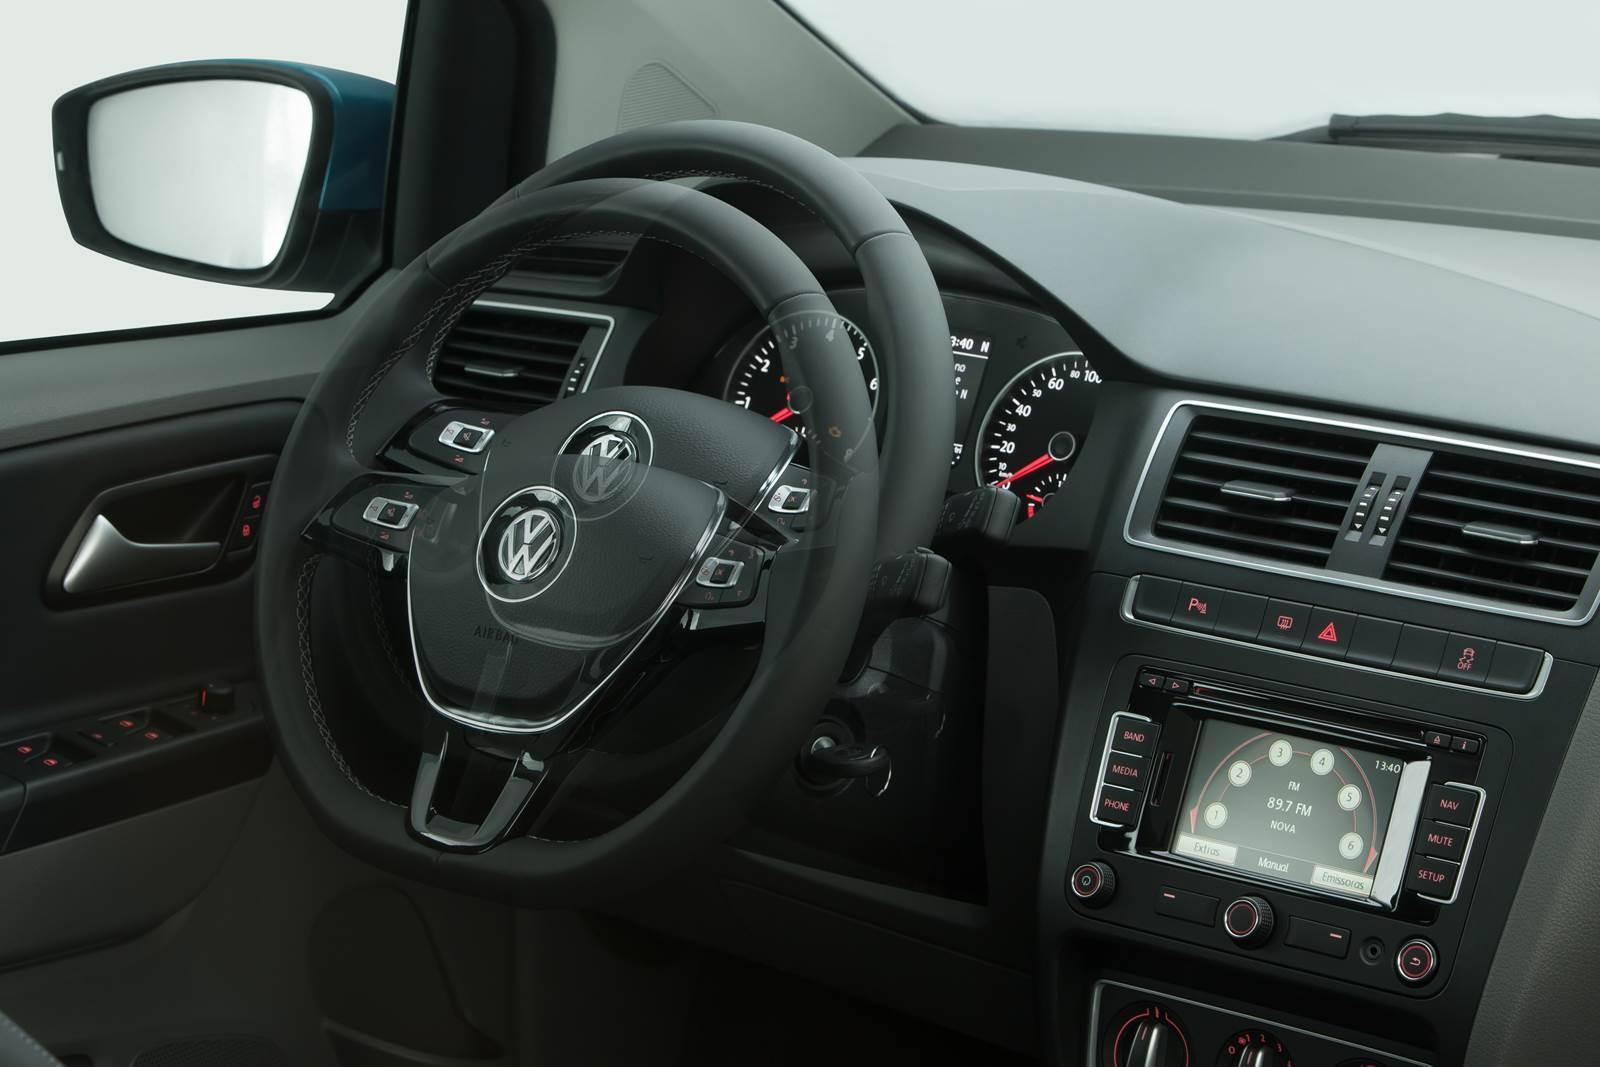 Novo VW Gol 2016 - interior